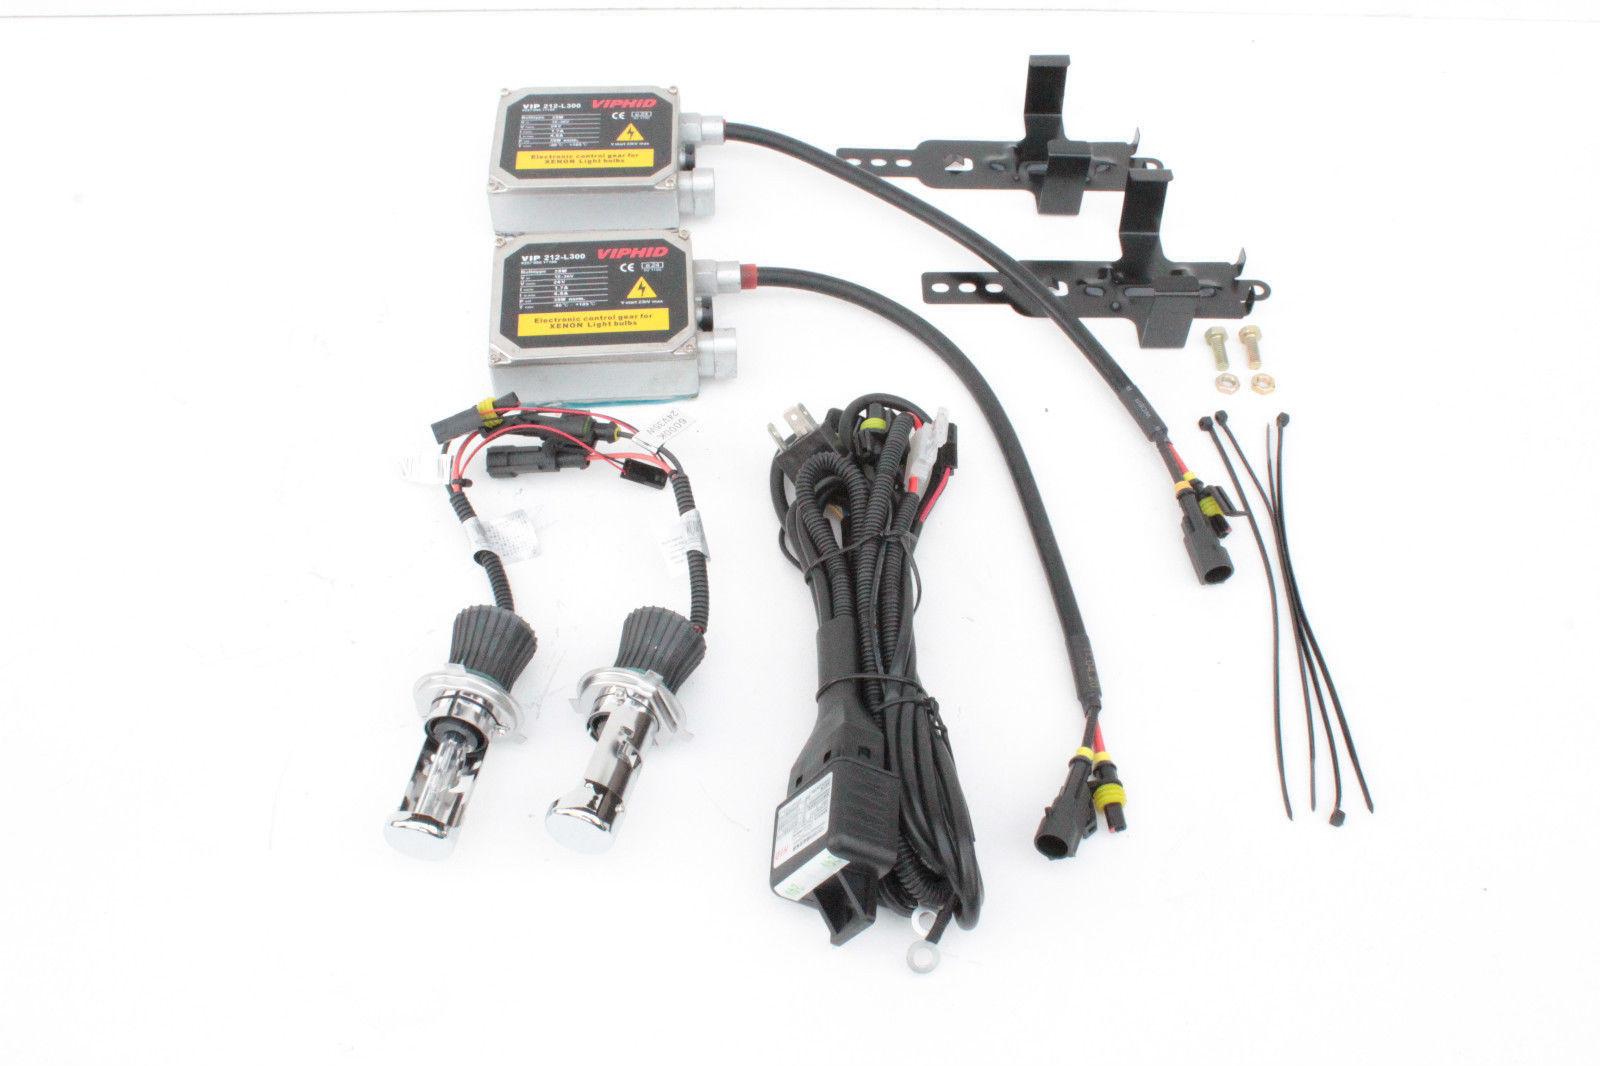 Hid Conversion Kit H4 24 Volt 35 Watt High Low With Slim